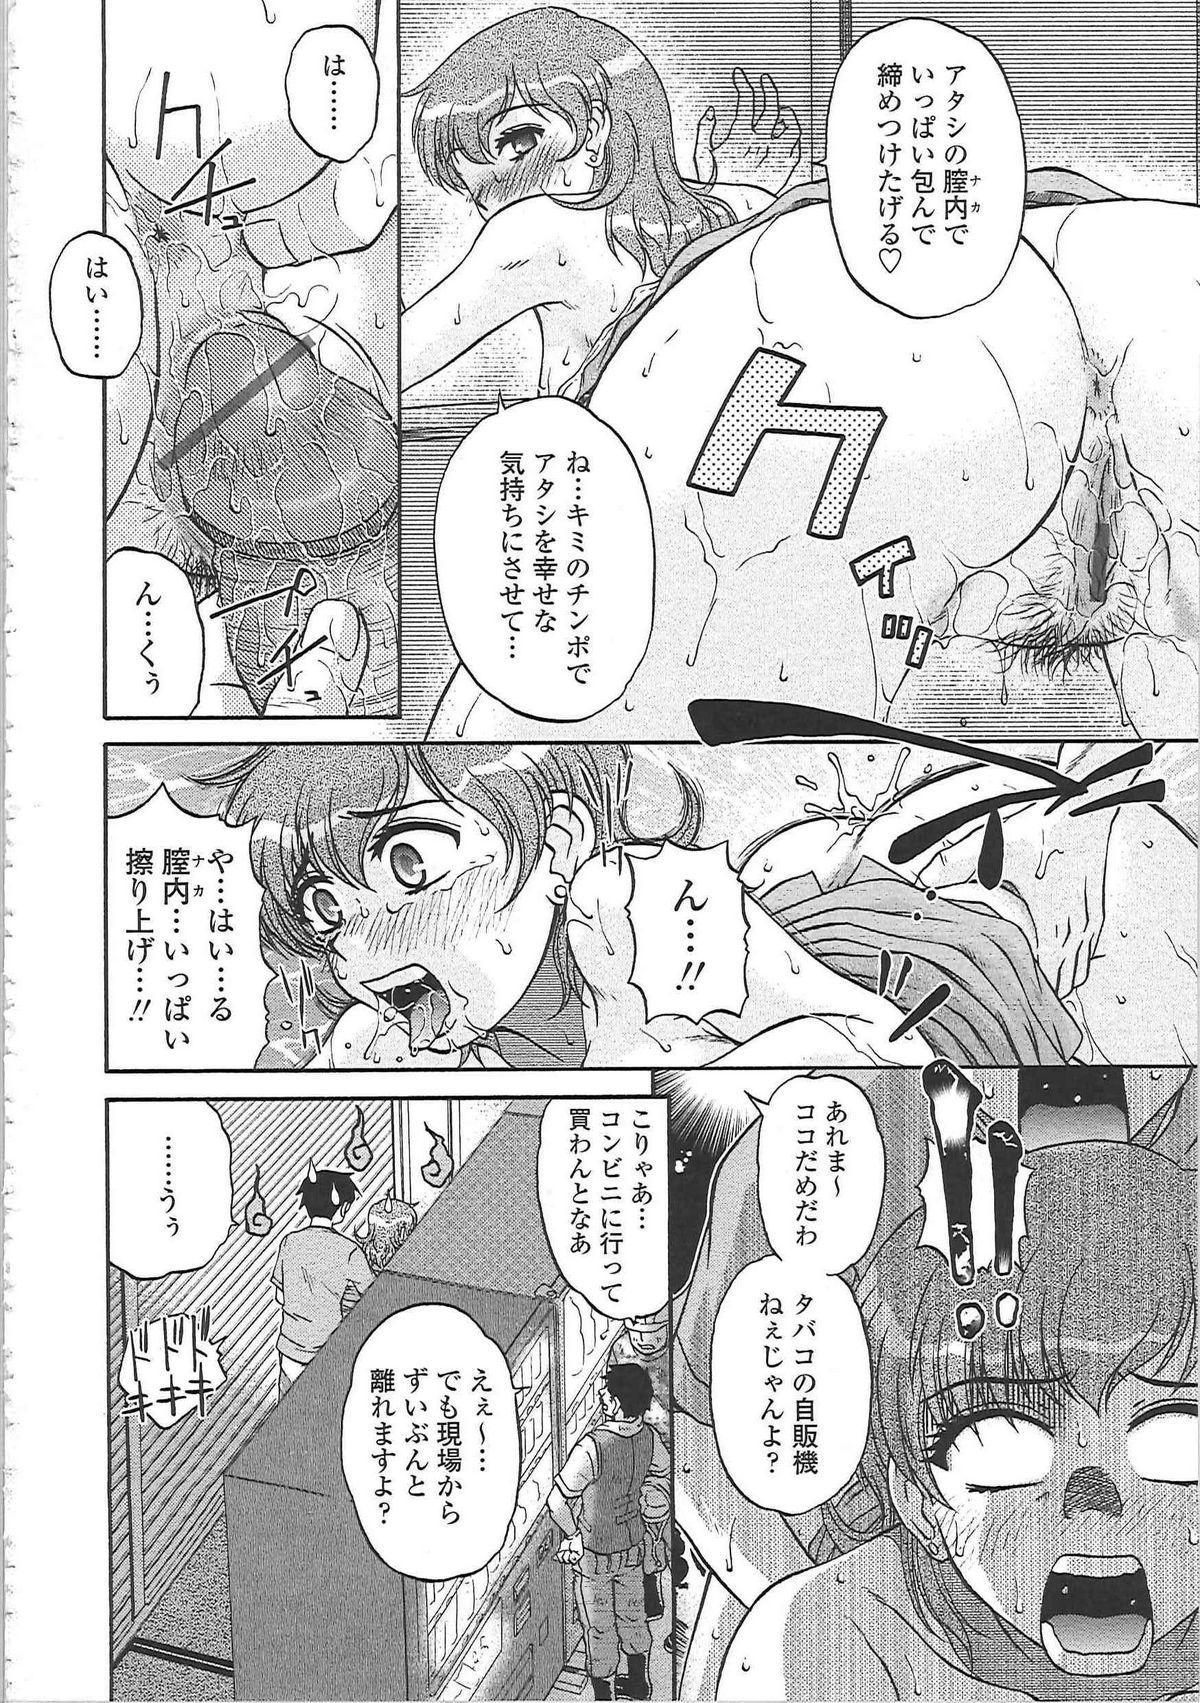 Nikuzuma Tsuushin - Erotic Wife Communication 158